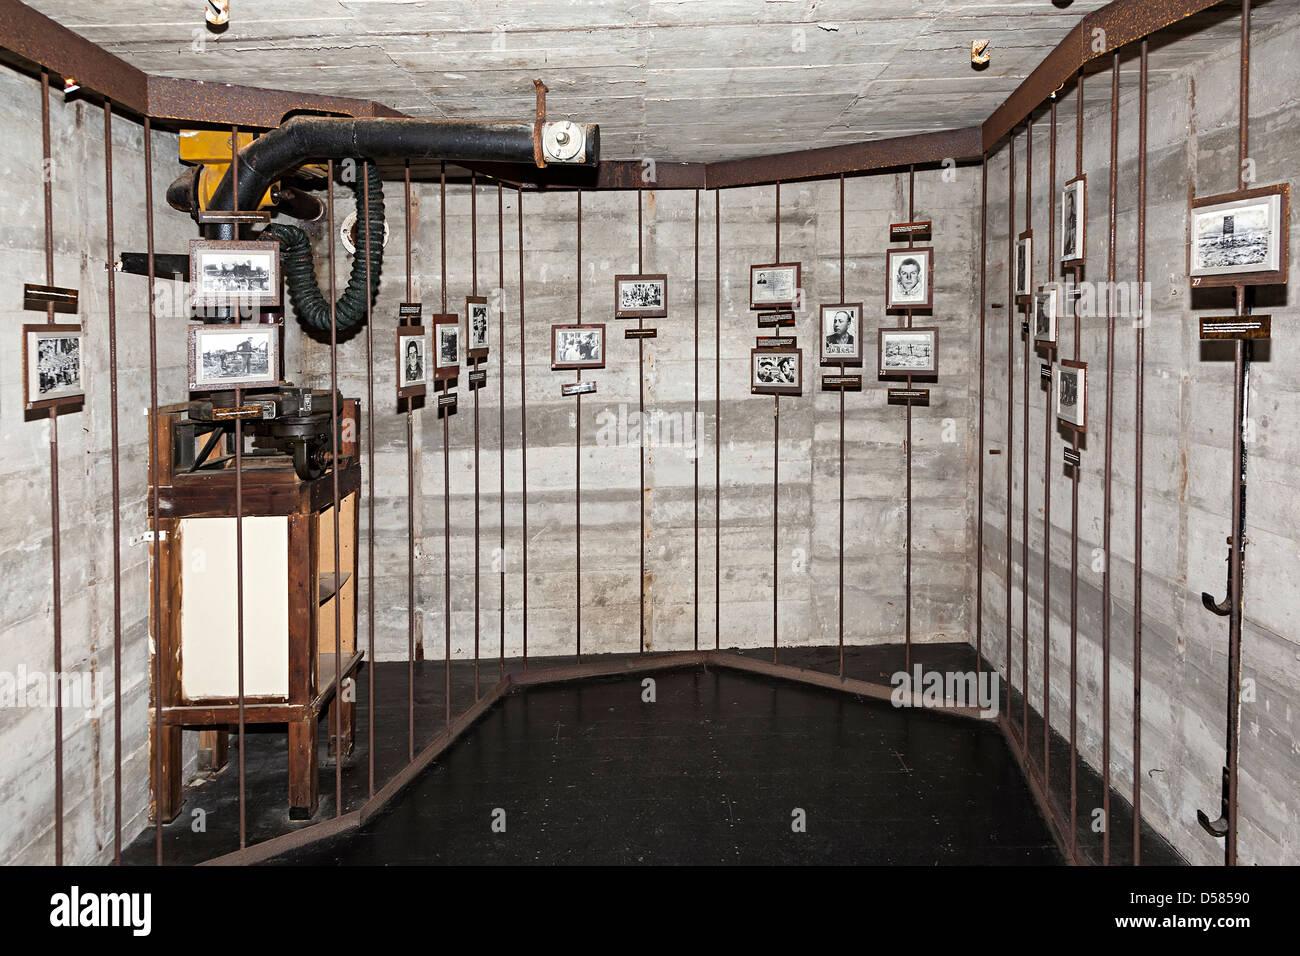 Memorial in the German command bunker at La Hougue Bie commemorating the islander prisoners, Jersey, Channel Islands, - Stock Image